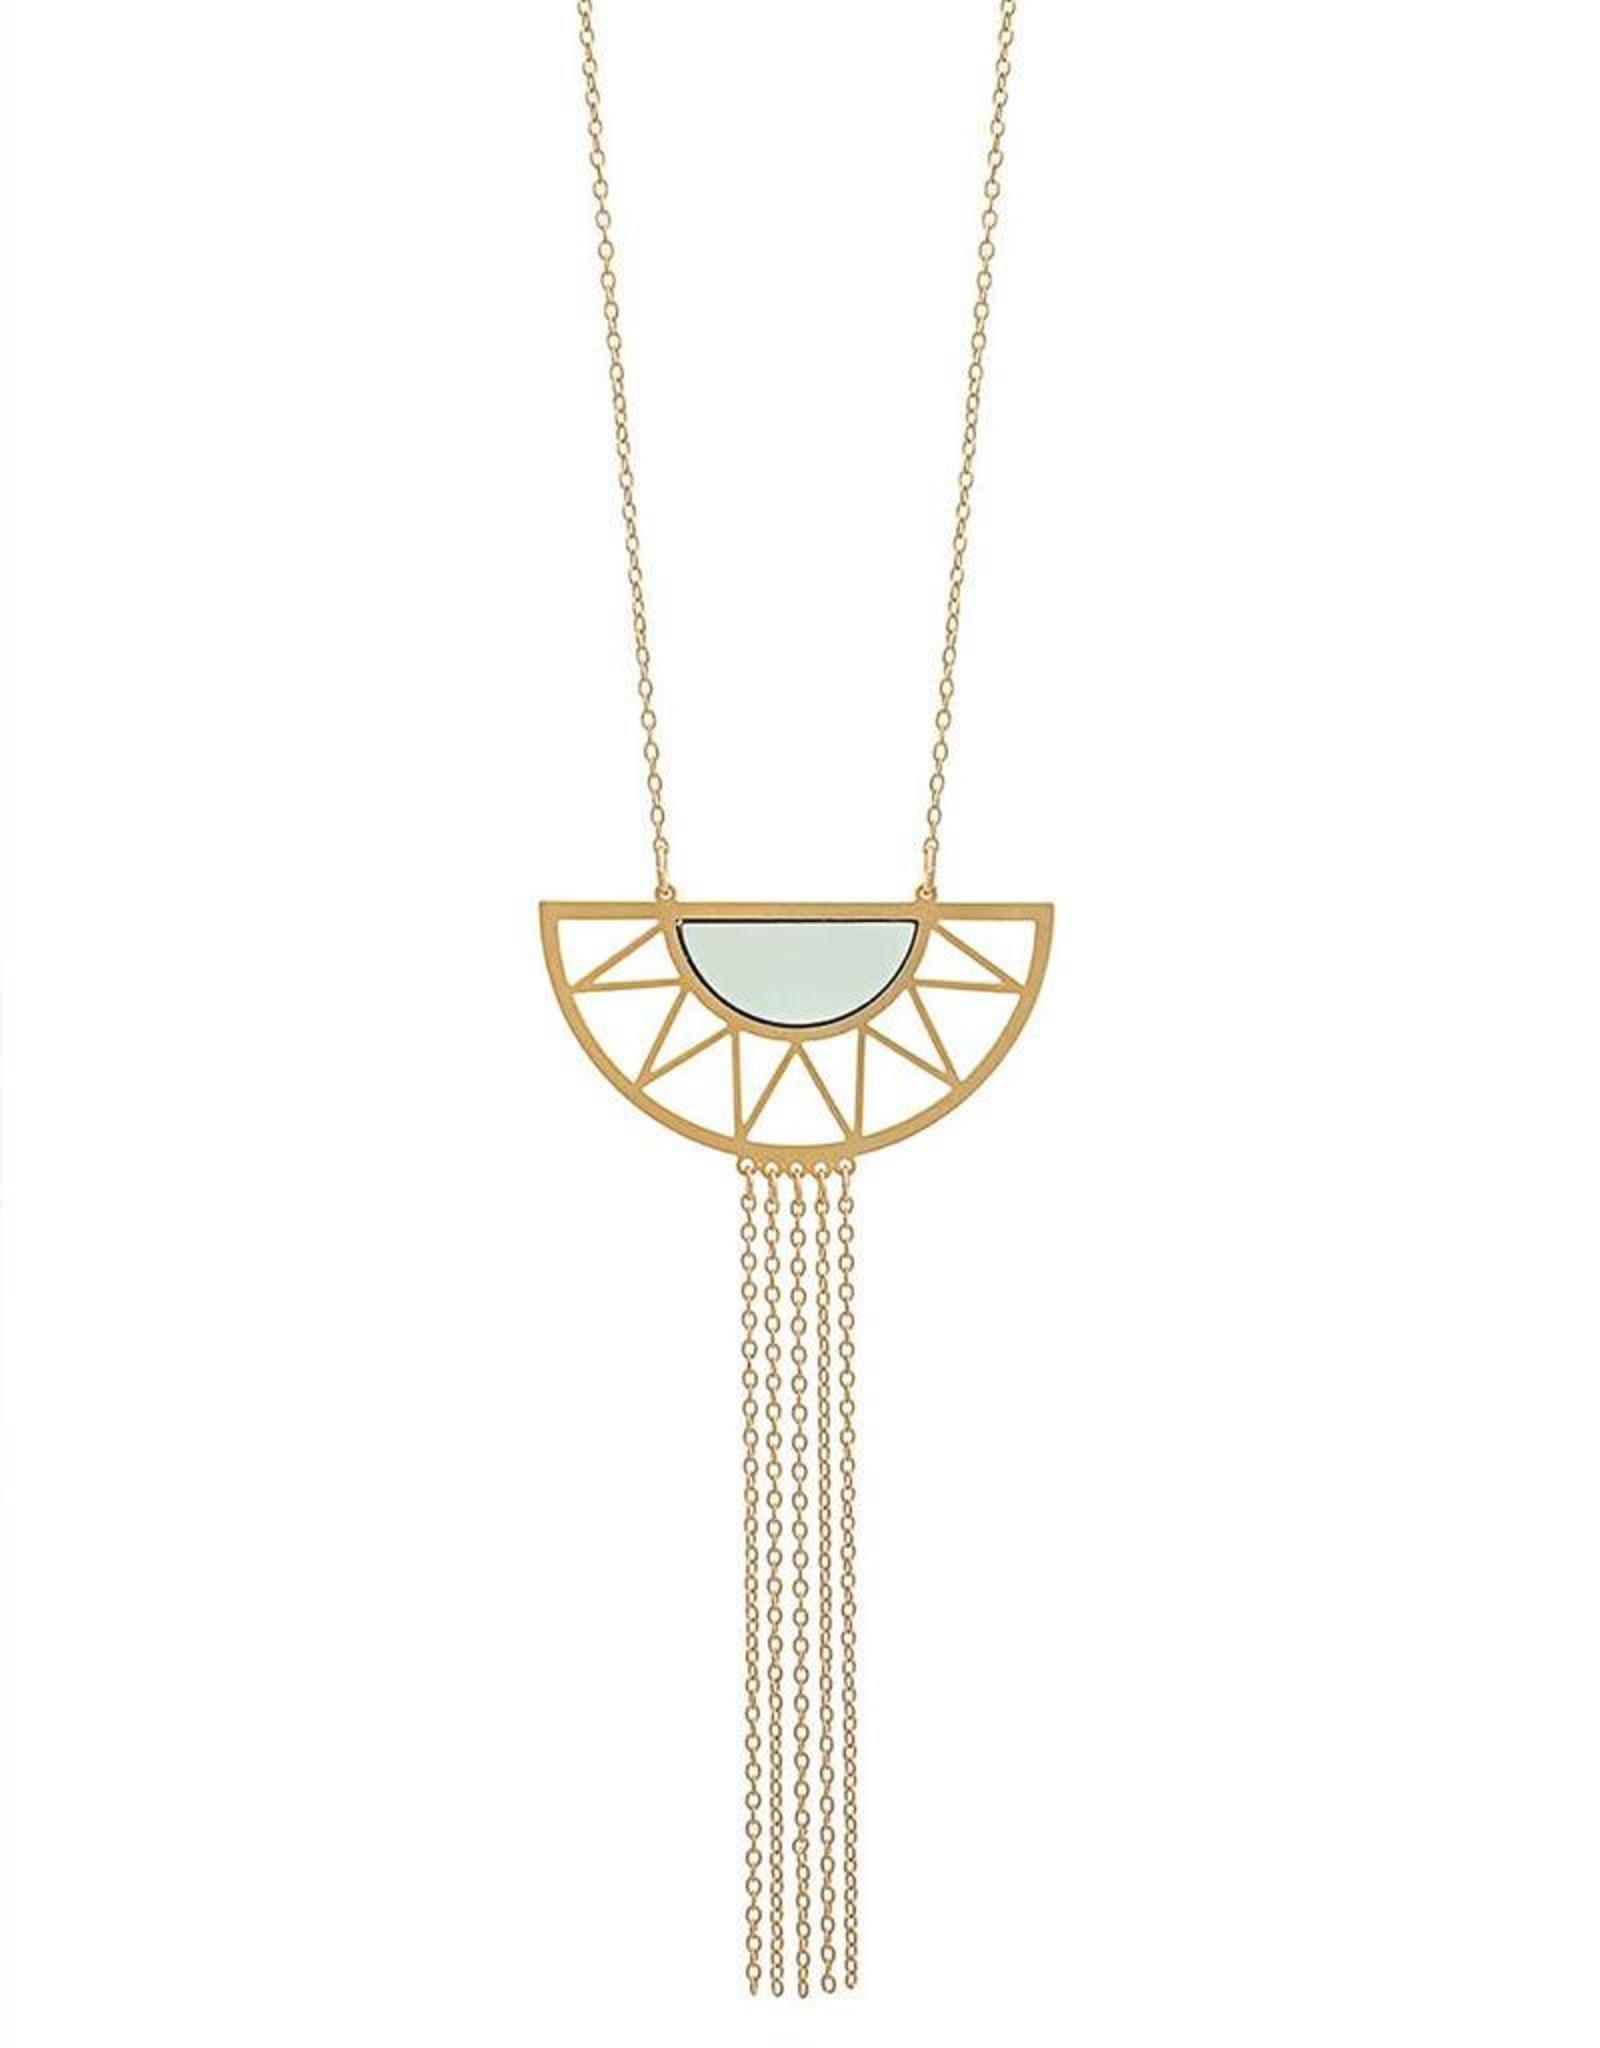 Shlomit Ofir Summer necklace